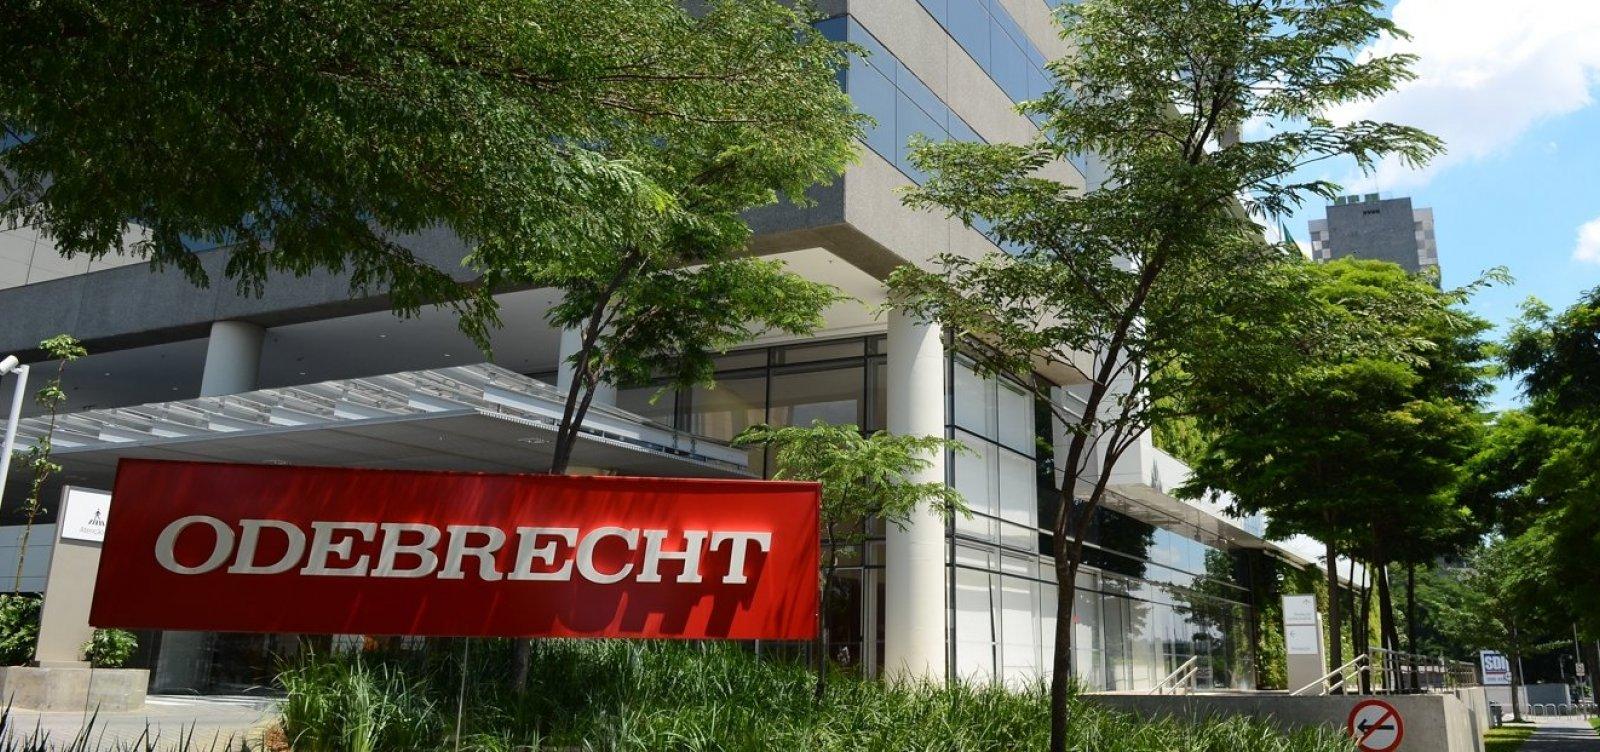 [Governo colombiano pede que Odebrecht seja proibida de fechar contratos públicos no país]